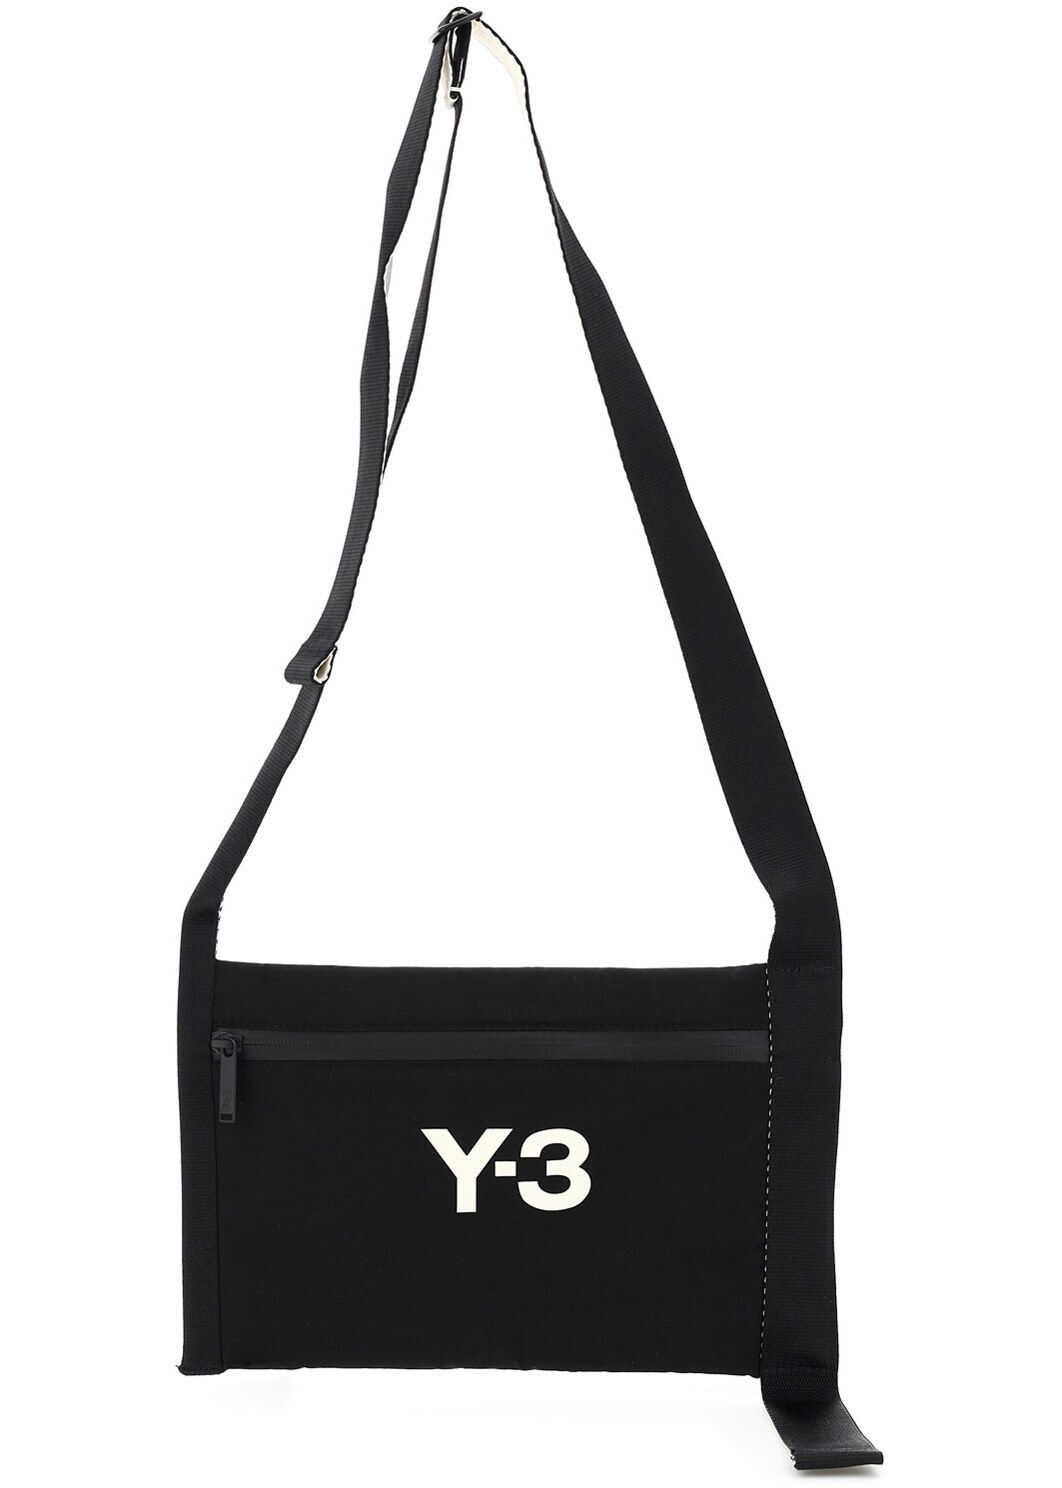 Y-3 GK2105 BLACK CREAM WHITE